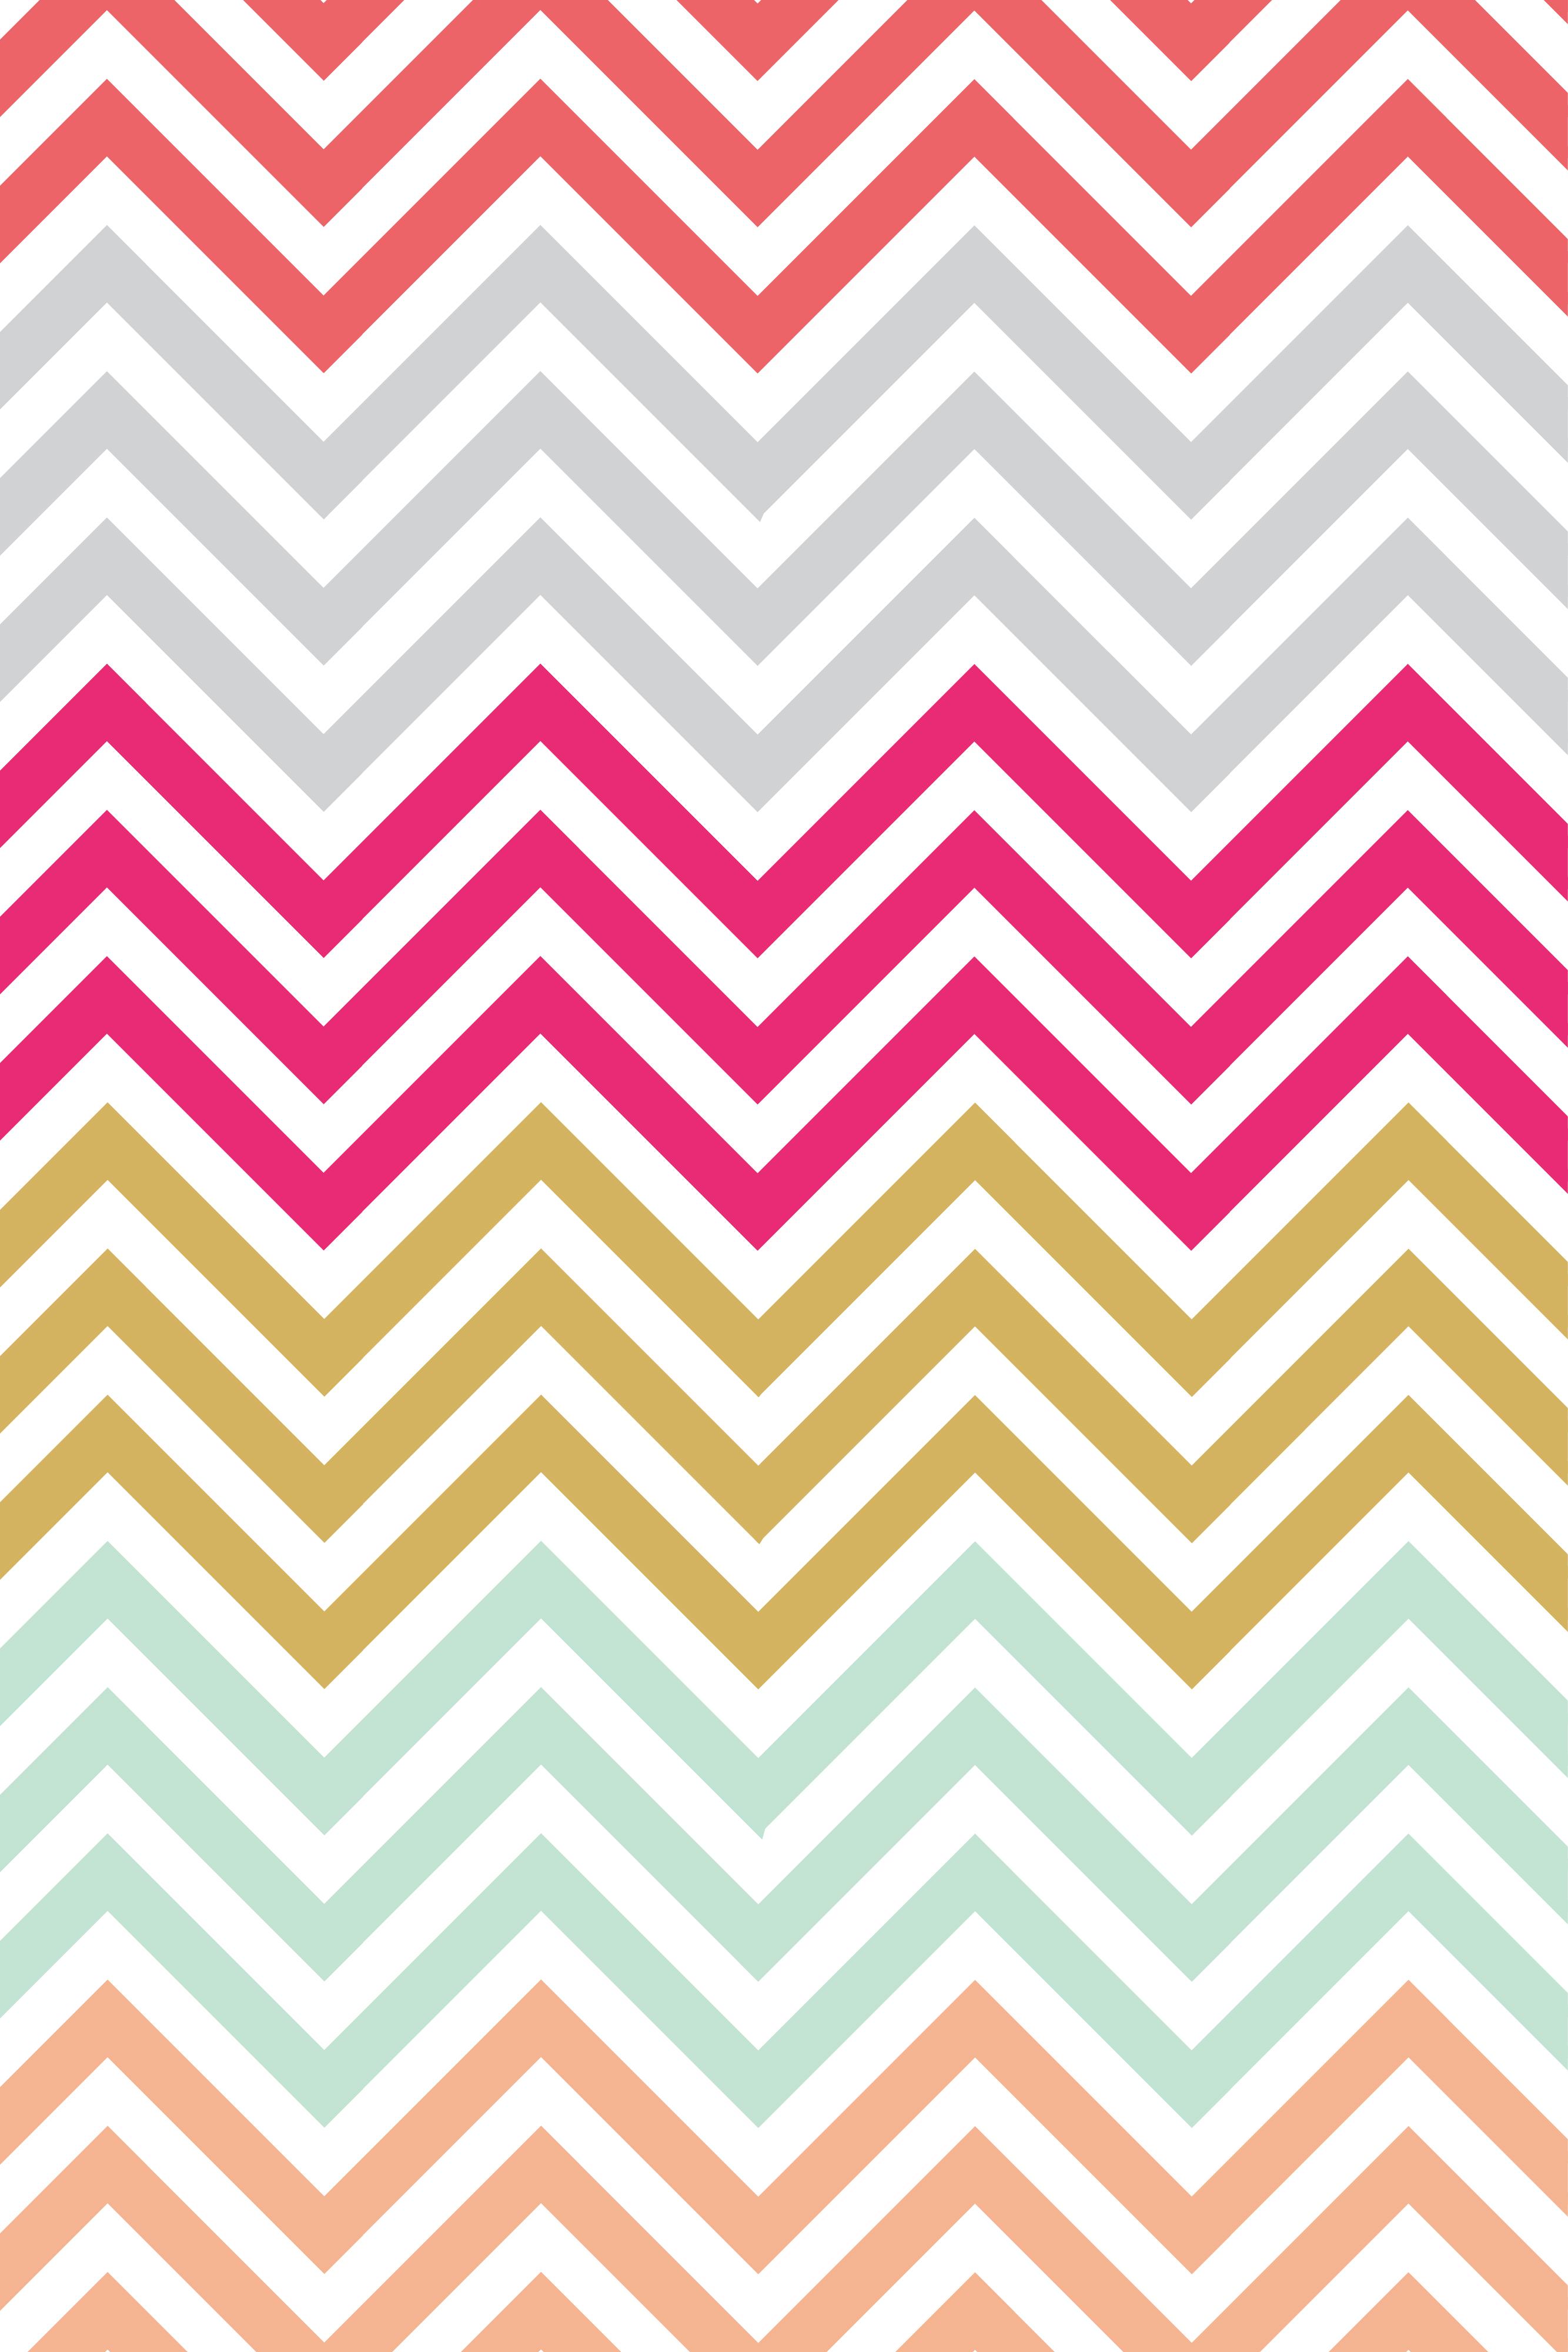 blushprintables-spring-chevron-jpg-×-pixels-wallpaper-wp5603503